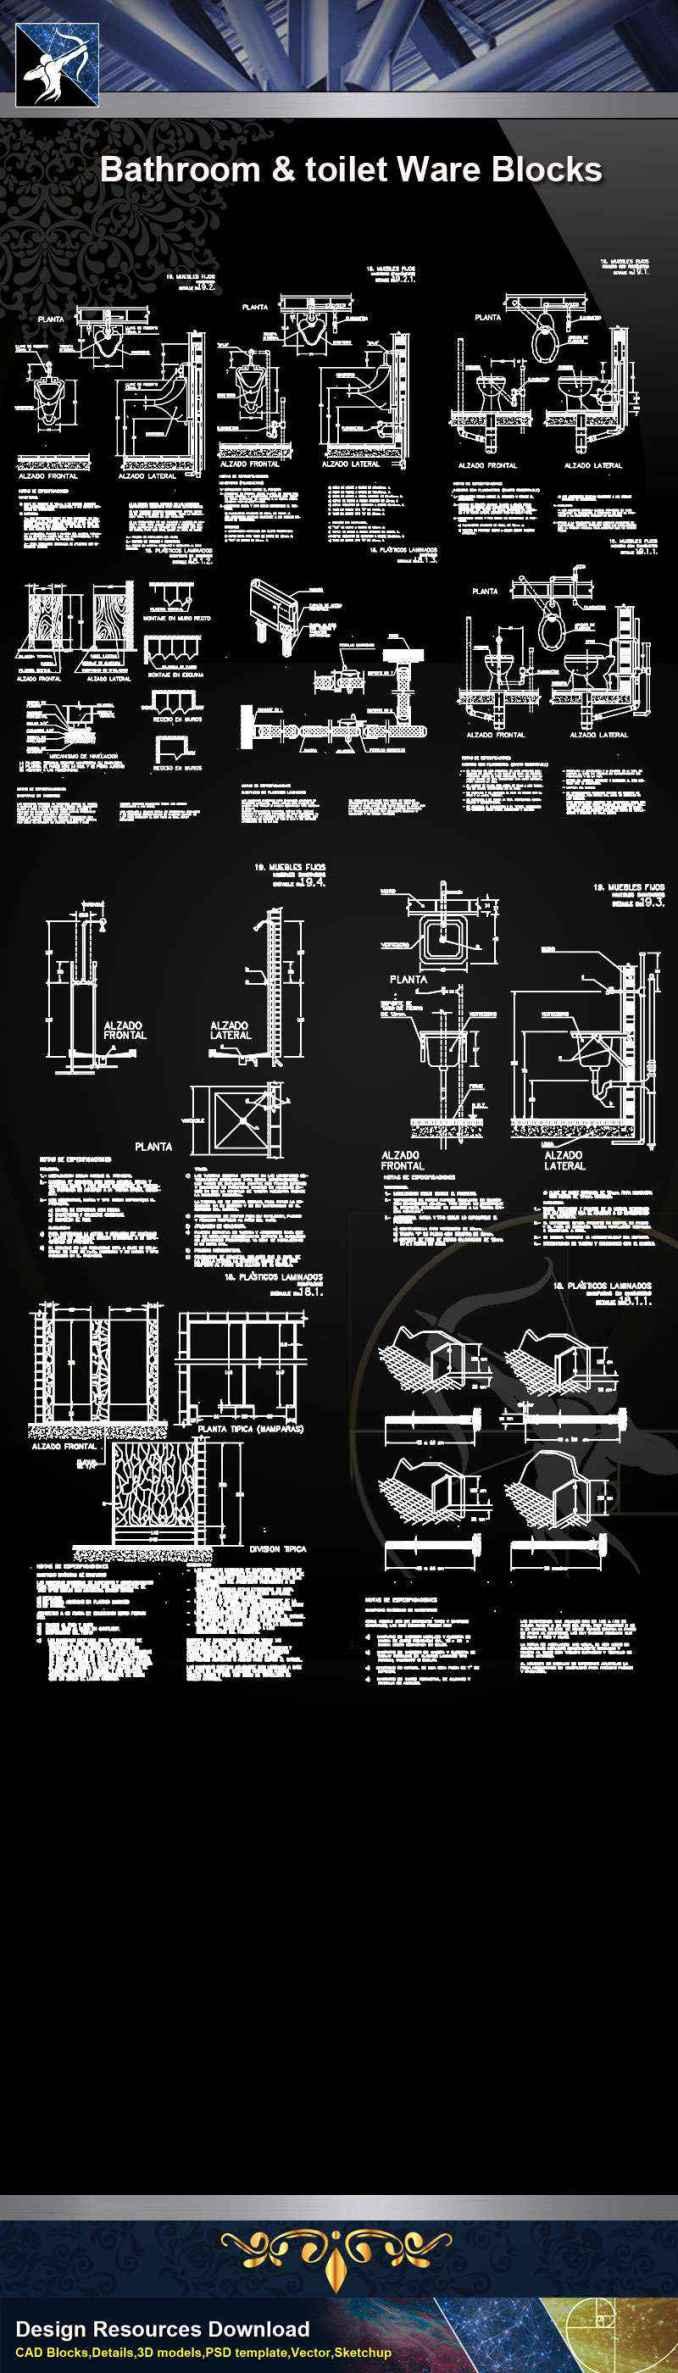 【Architecture CAD Details Collections】Bathroom & Toilet Ware CAD Blocks